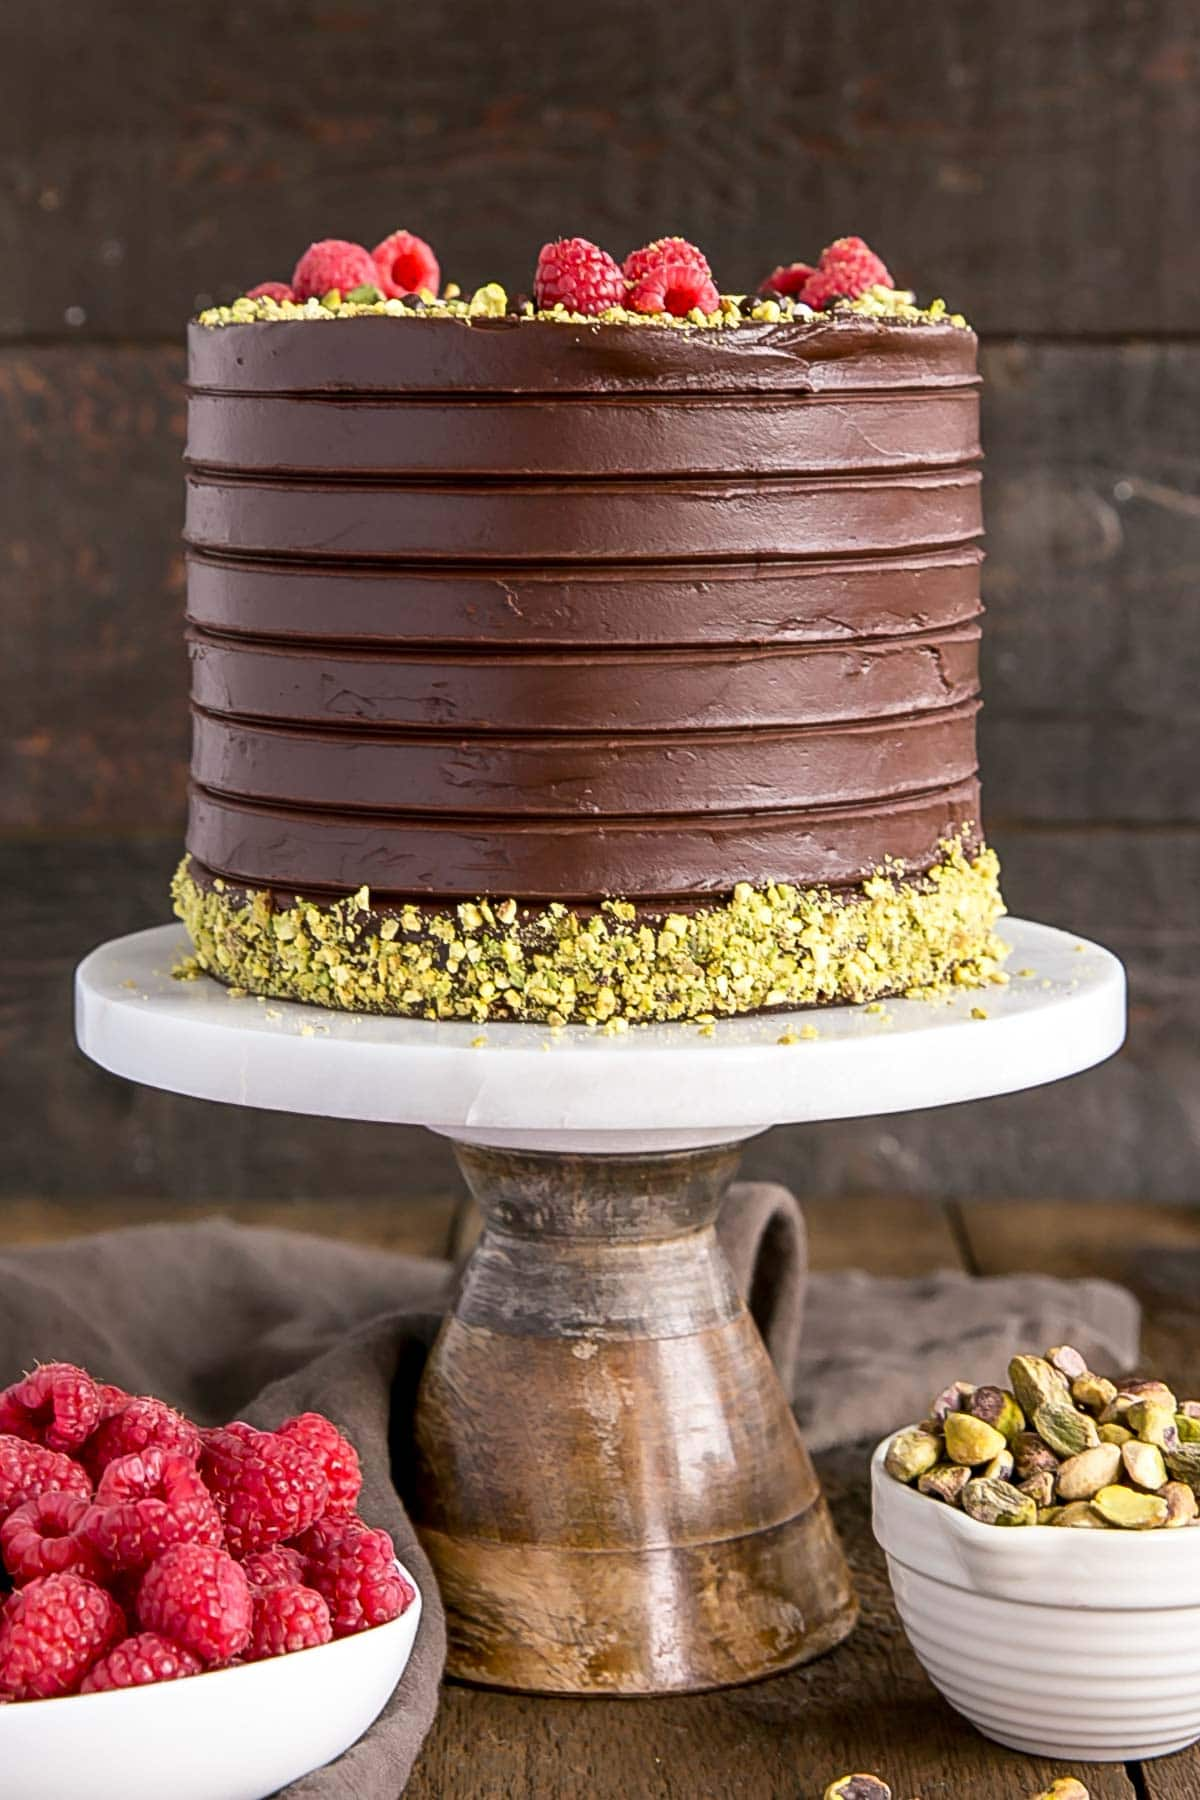 This Pistachio Cake with Dark Chocolate Ganache